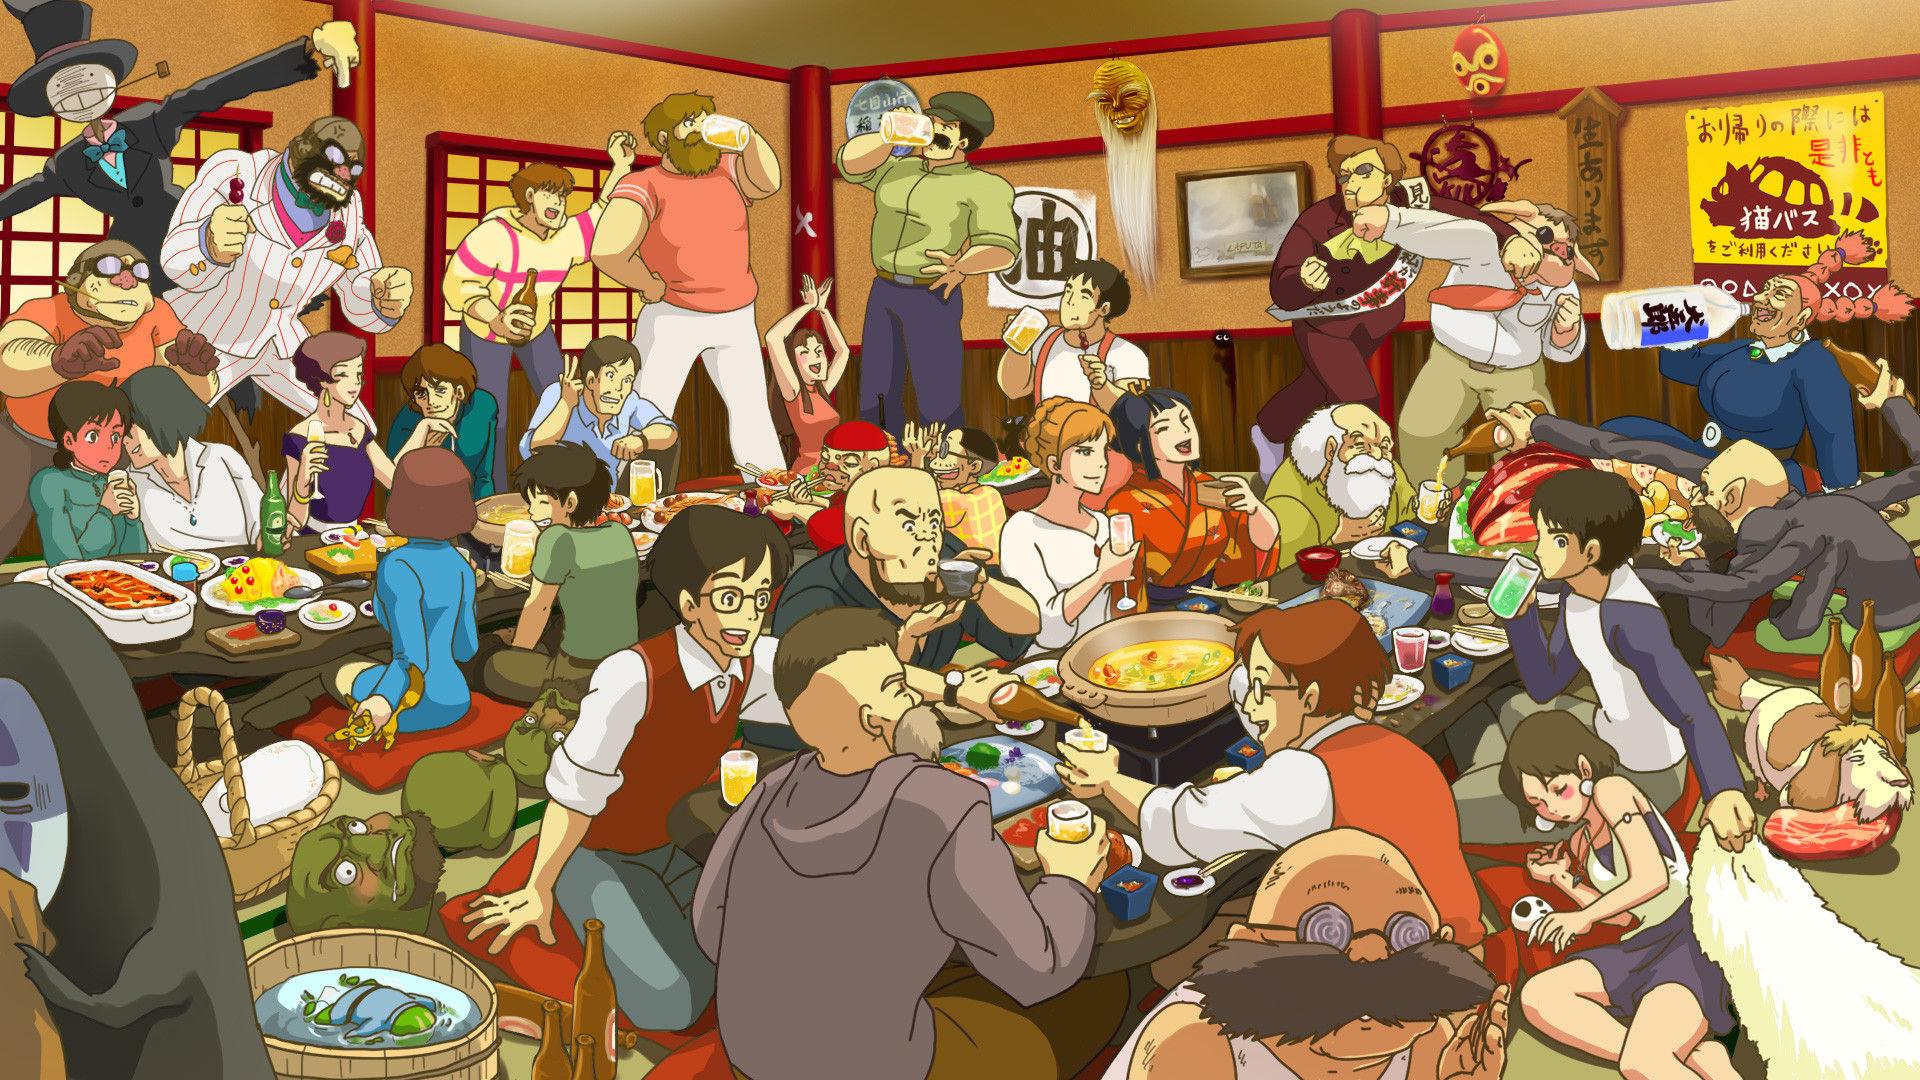 「宴会」の画像検索結果